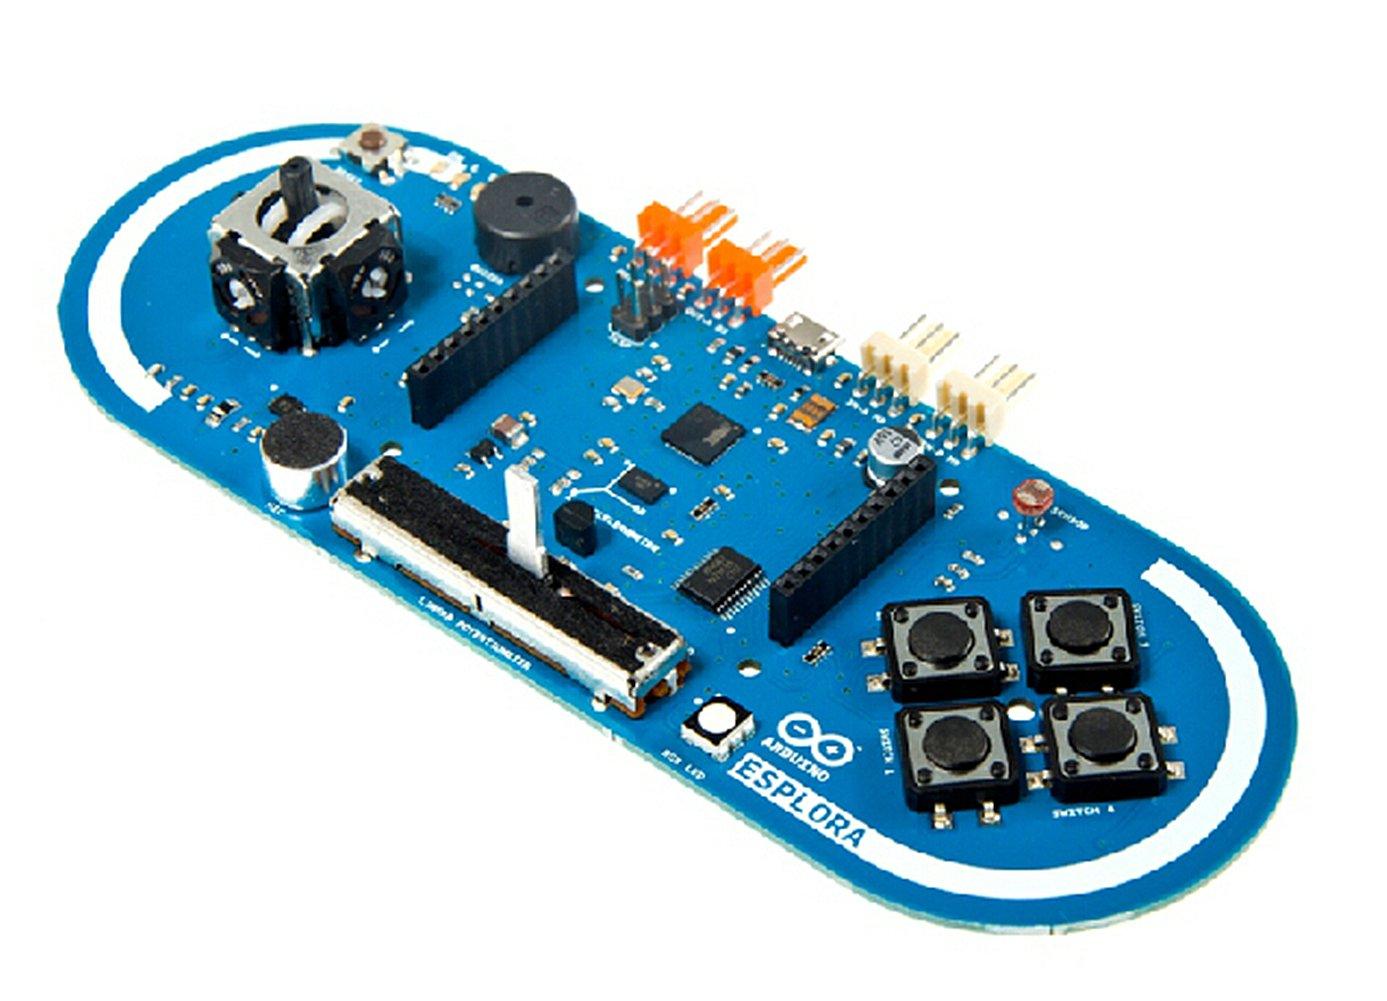 Arduino Esplora/The Esplora Has Onboard Sound And Light Outputs, And Several Input Sensors, Including A Joystick, A Slider, A Temperature Sensor, An Accelerometer, A Microphone, And A Light Sensor